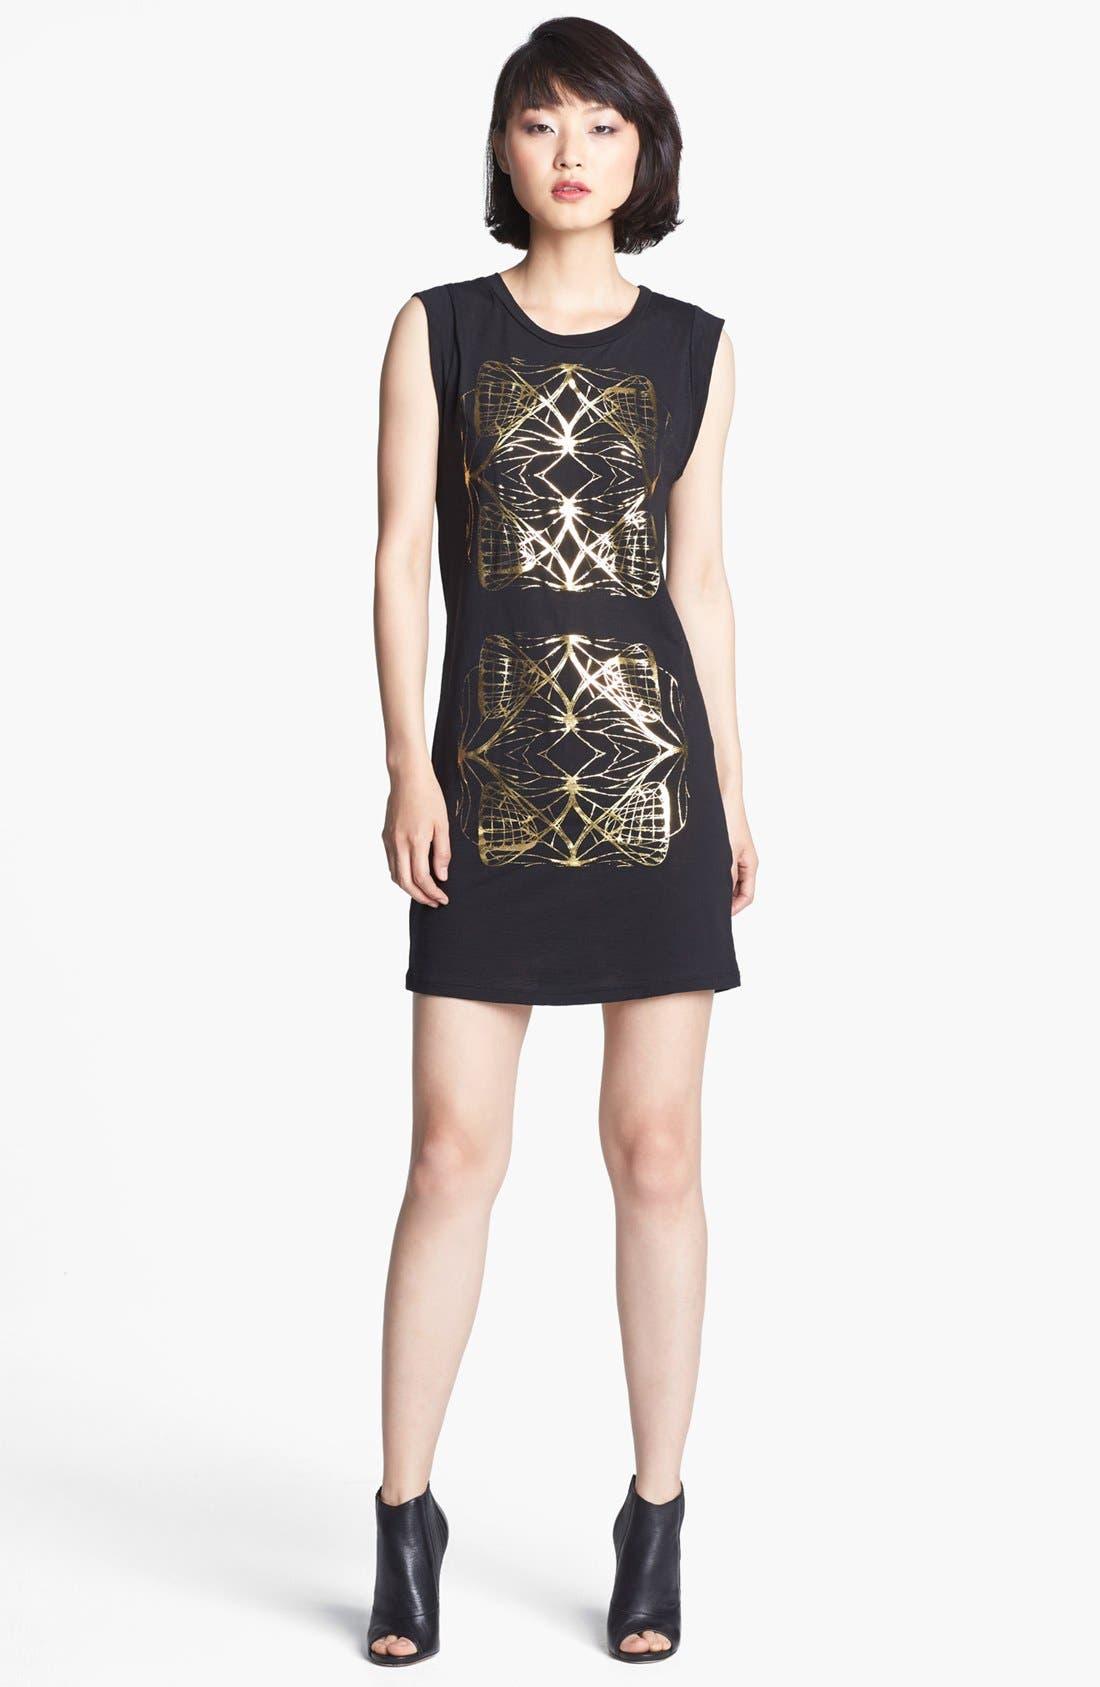 Main Image - Kelly Wearstler 'Diamond' Foiled Print Dress